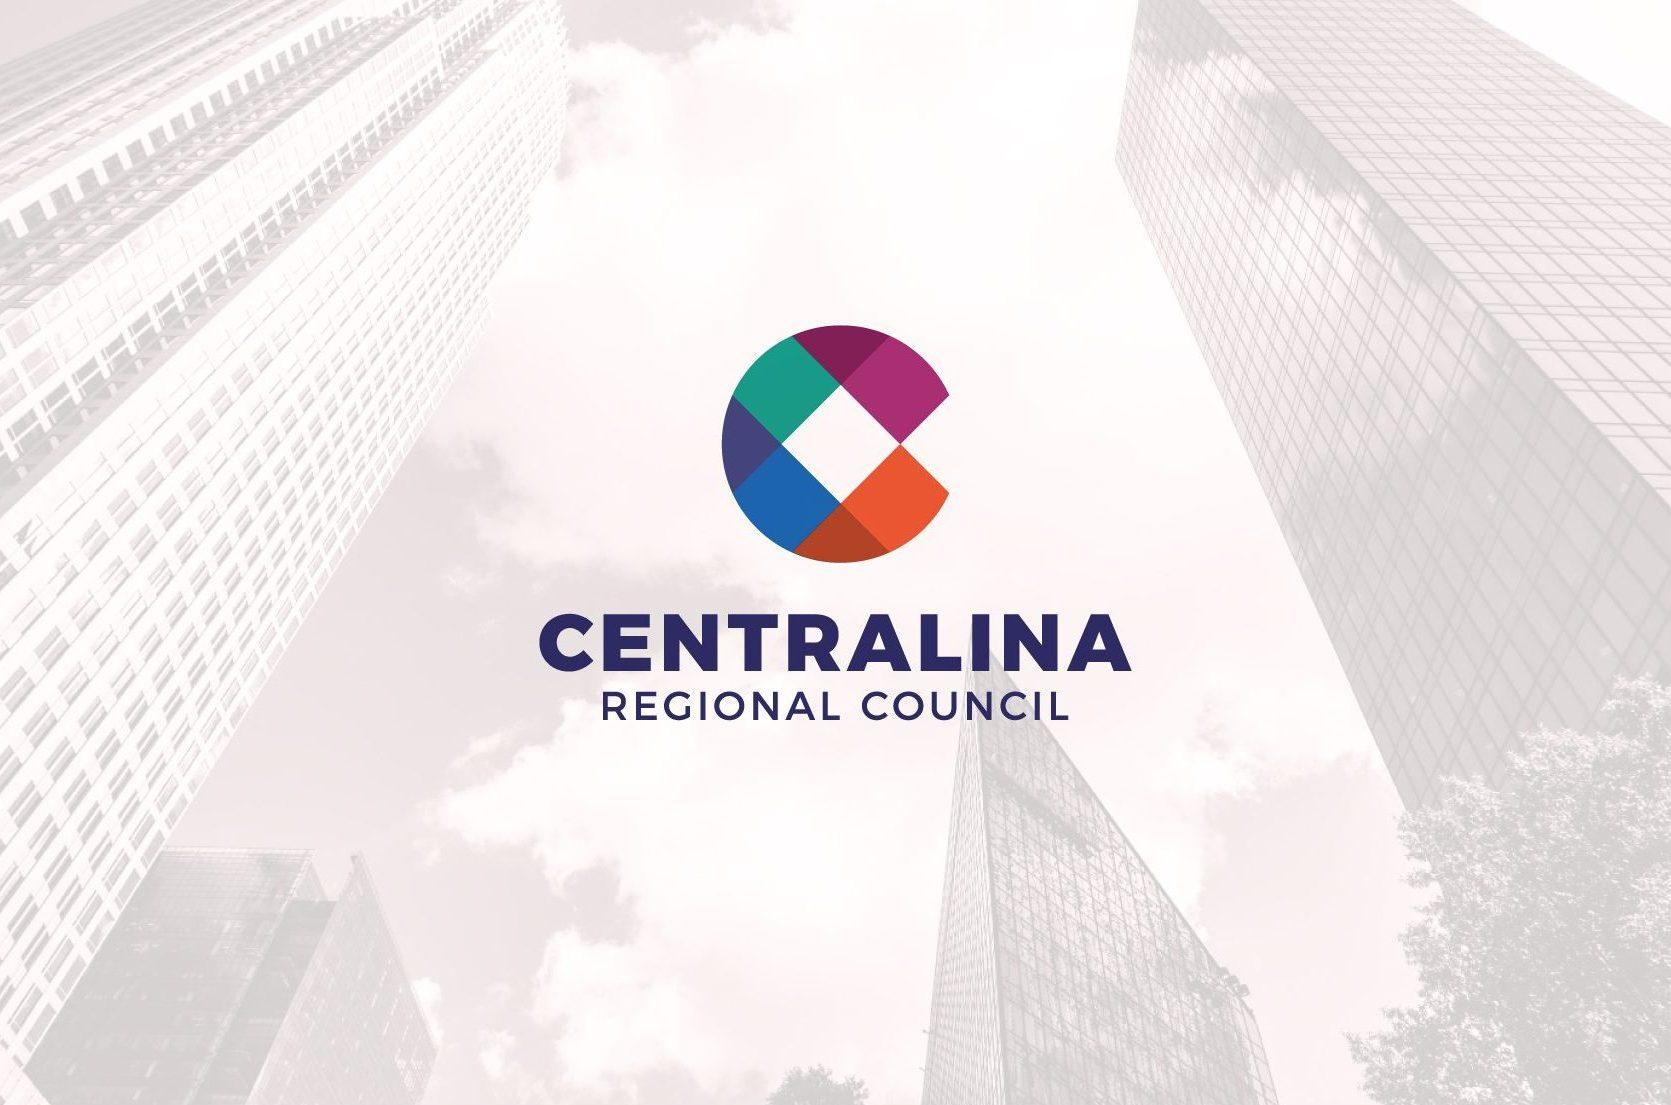 Centralina Regional Council | Rebrand